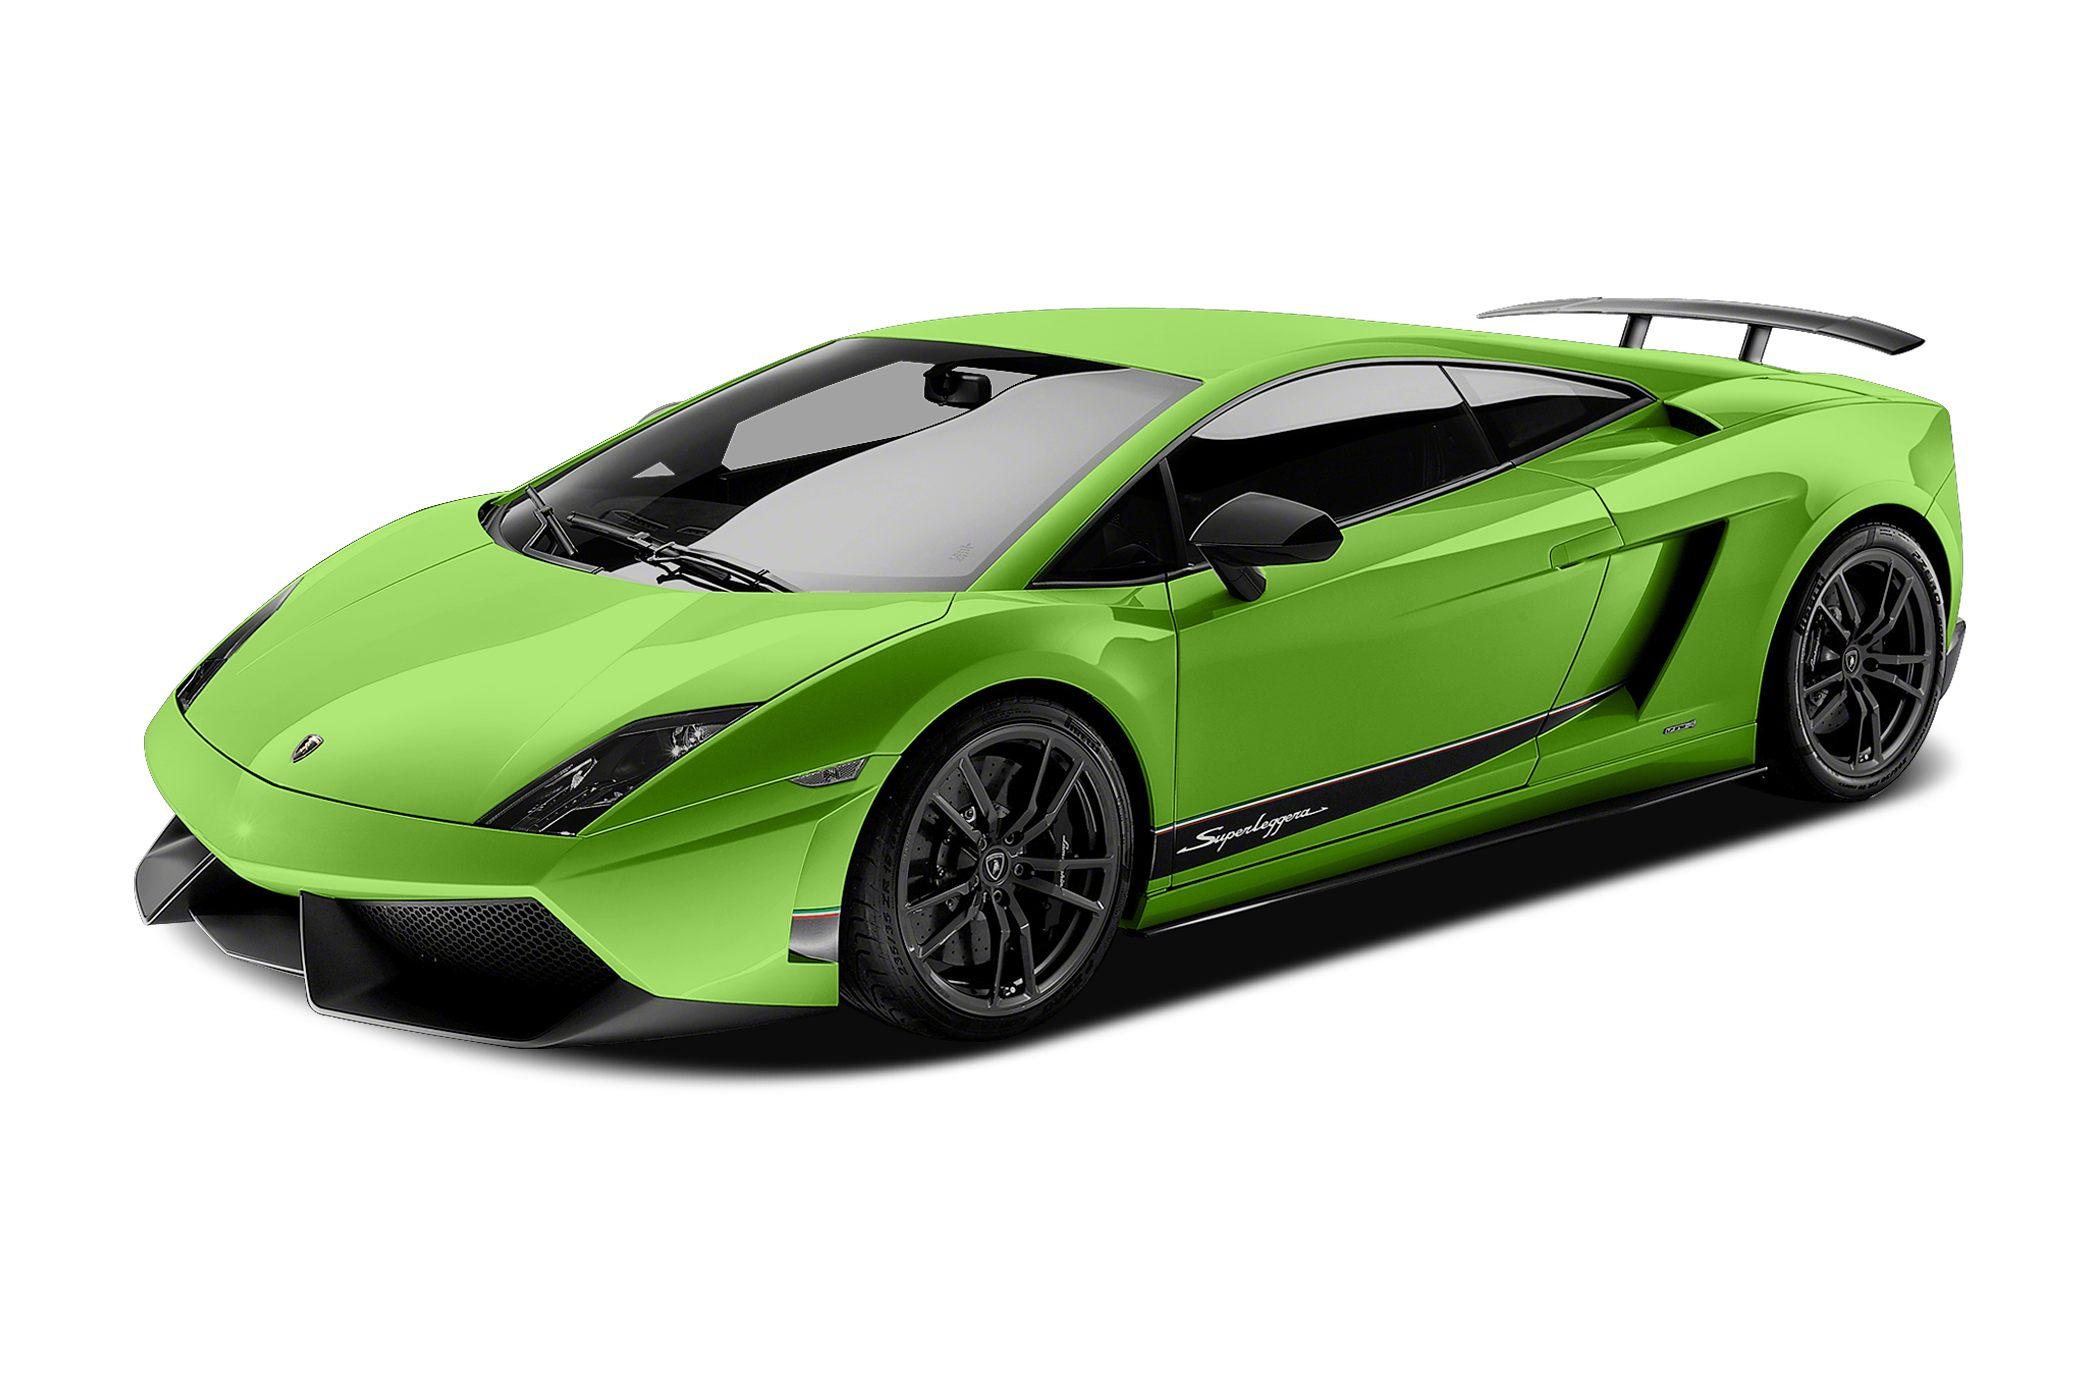 2012 Lamborghini Gallardo